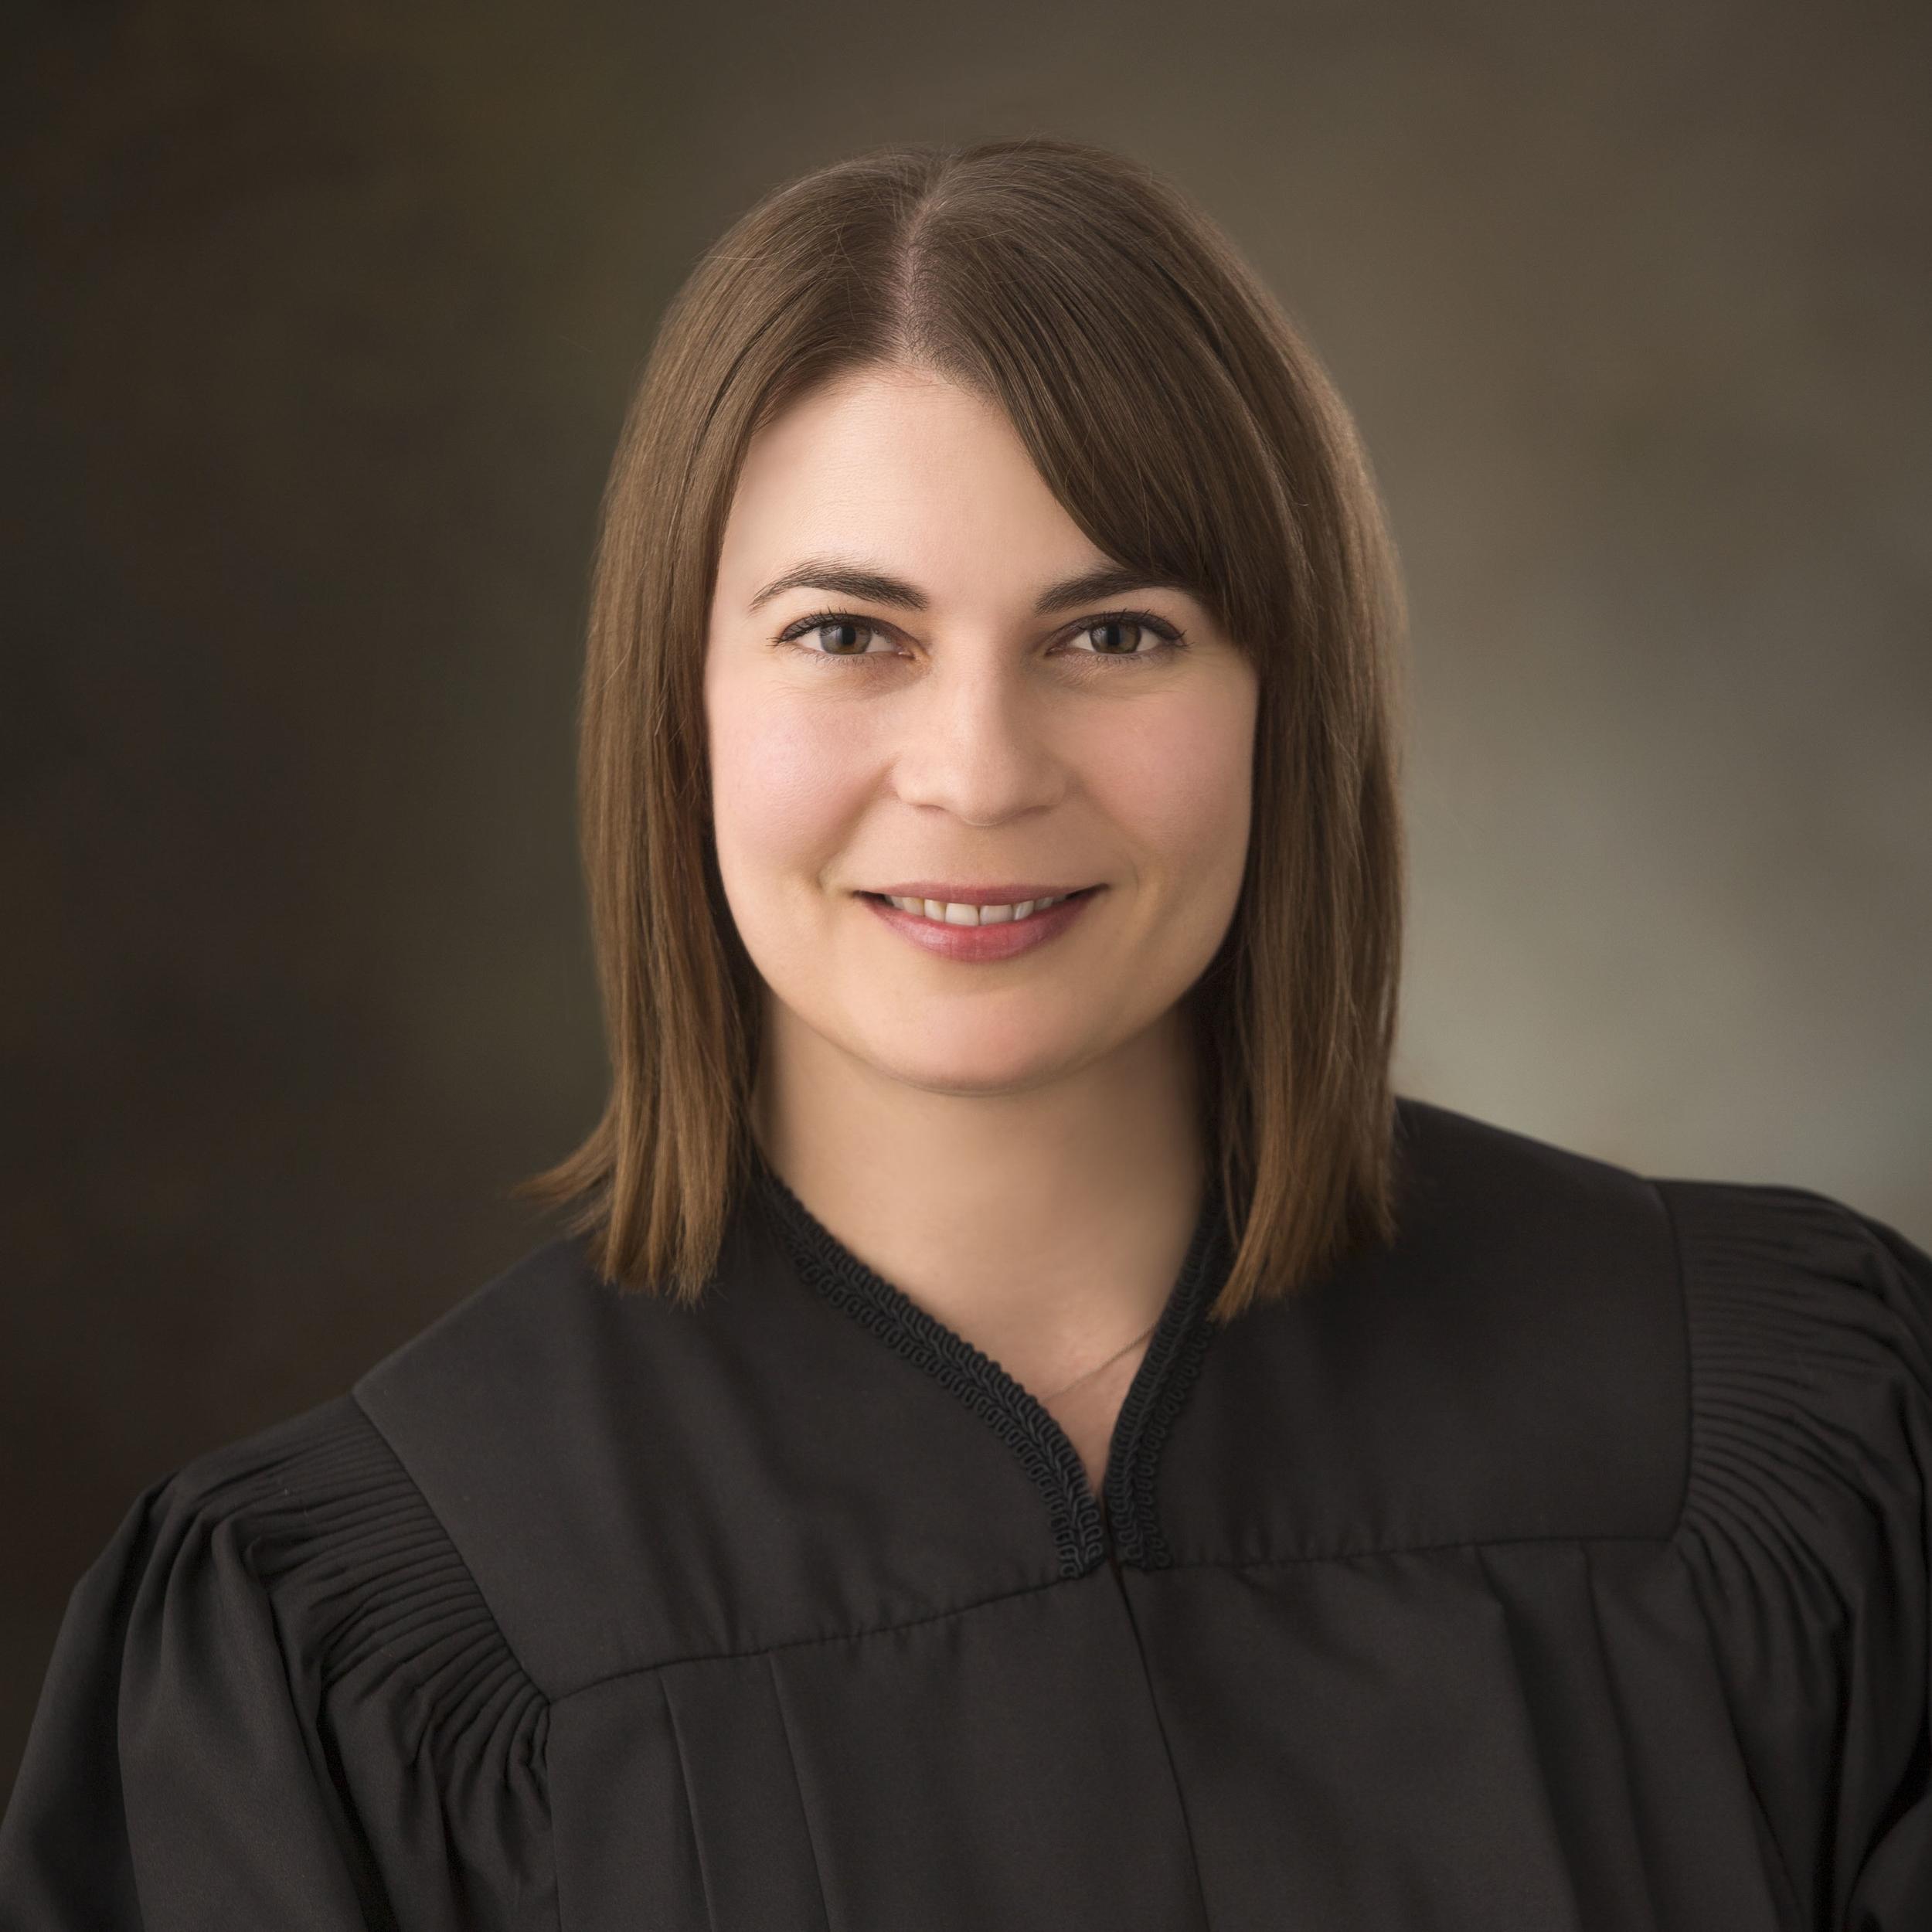 Judge Paige Petersen HiRes.jpg